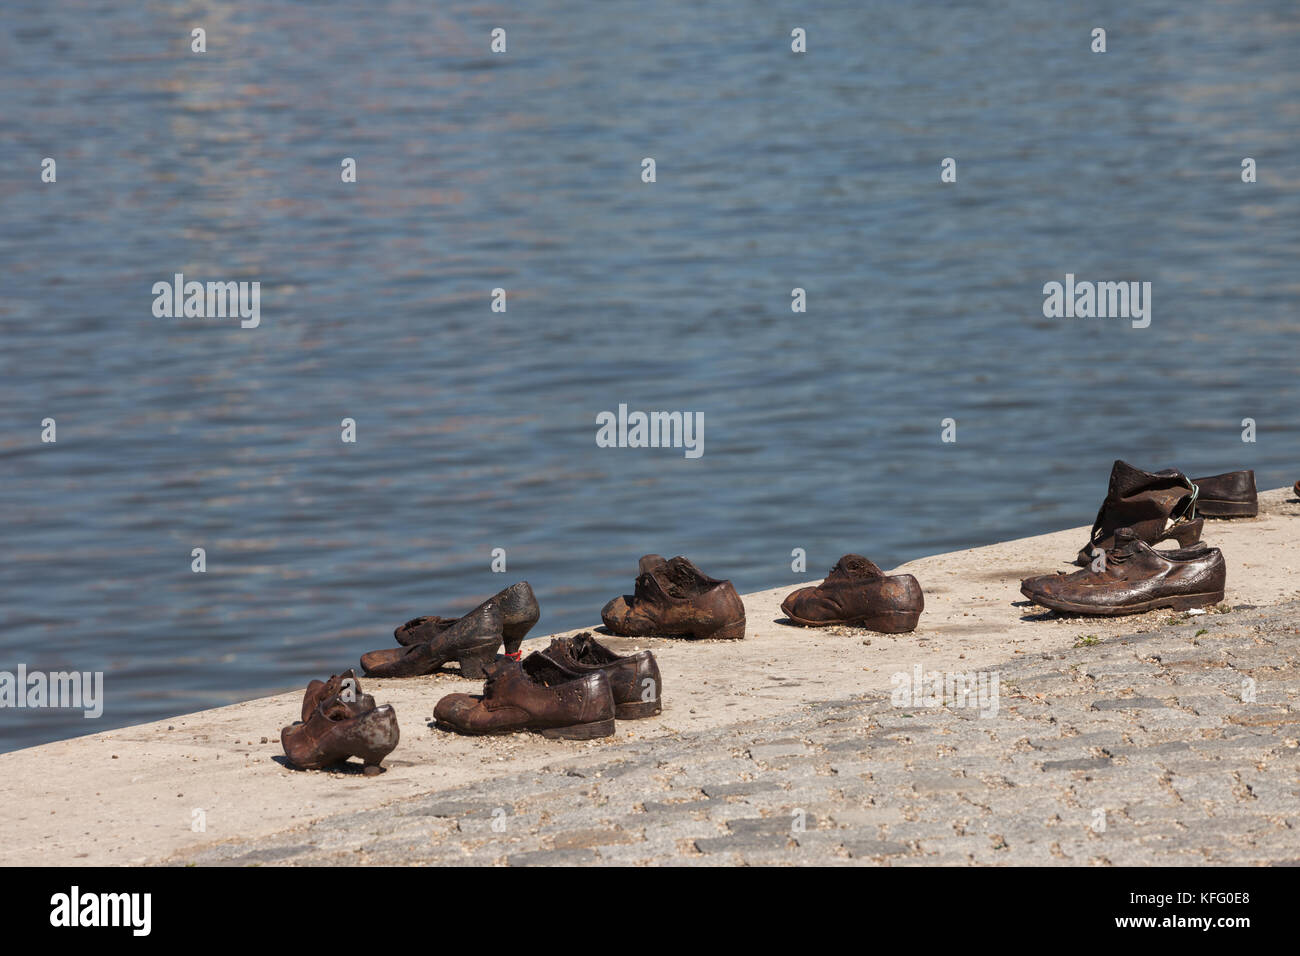 Schuhe Am Donauufer Denkmal Am Ufer Des Flusses In Budapest Ungarn